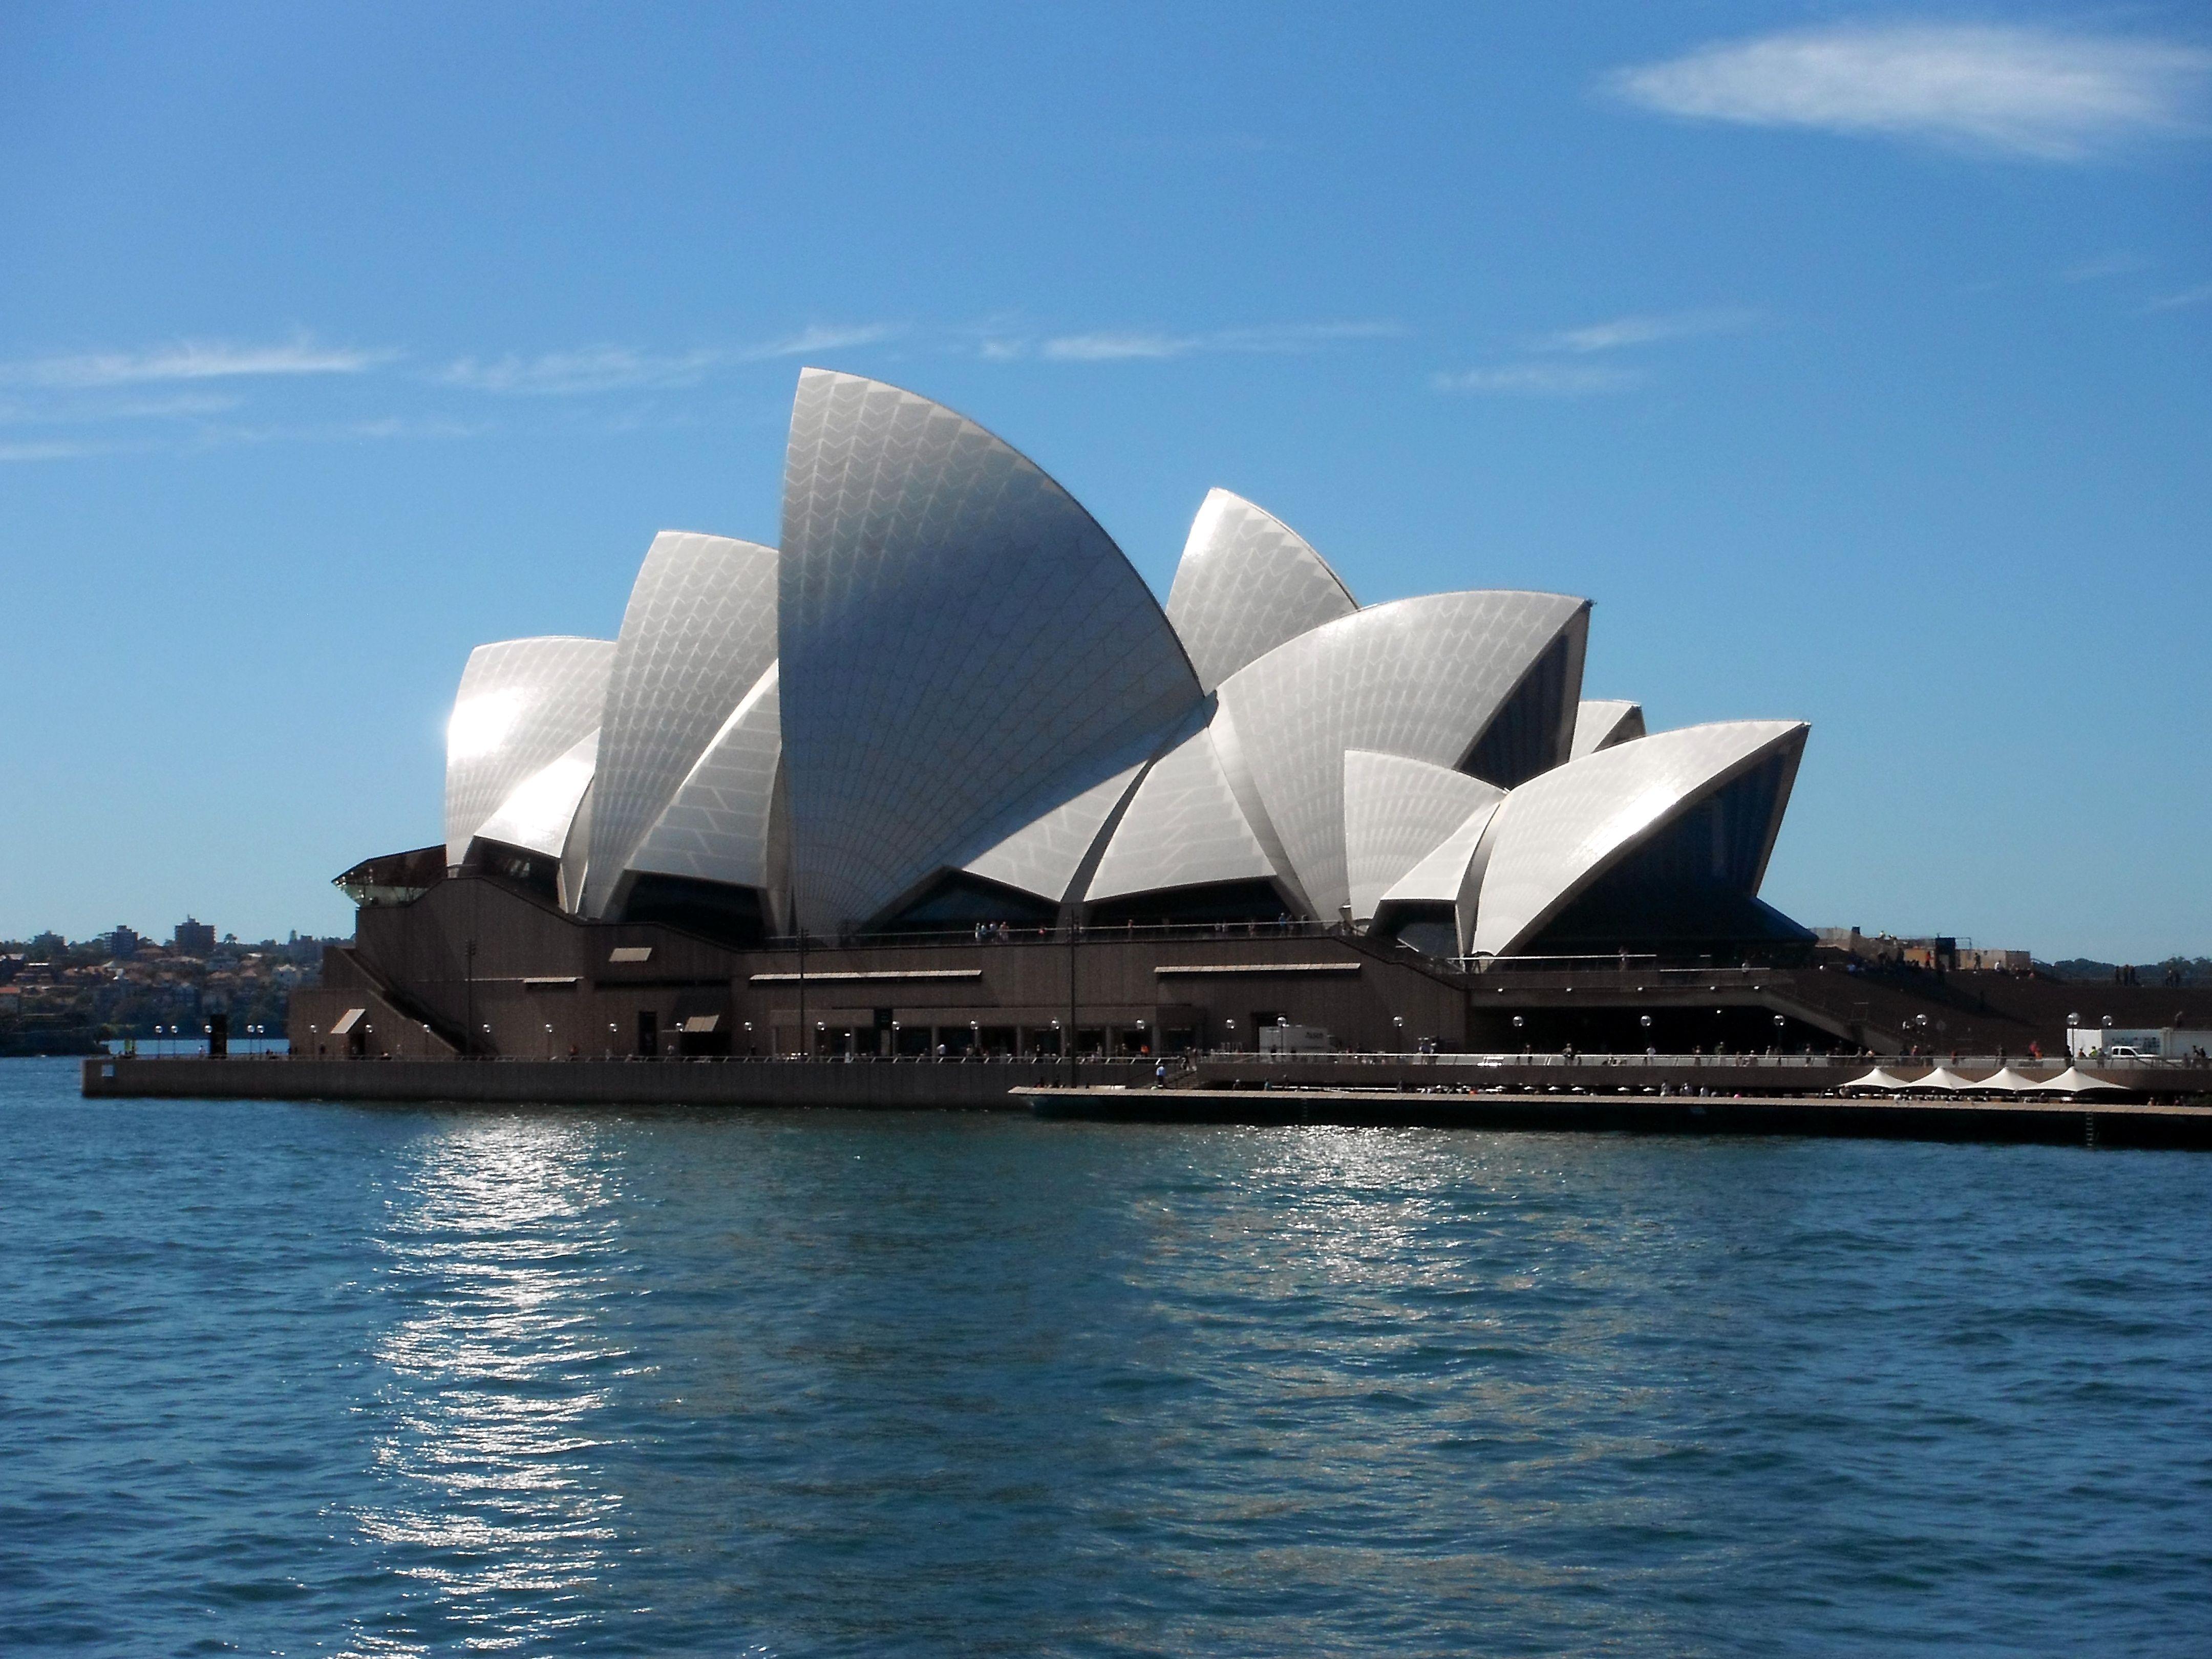 Sydney Opera House - Photography by Christina Capellaro